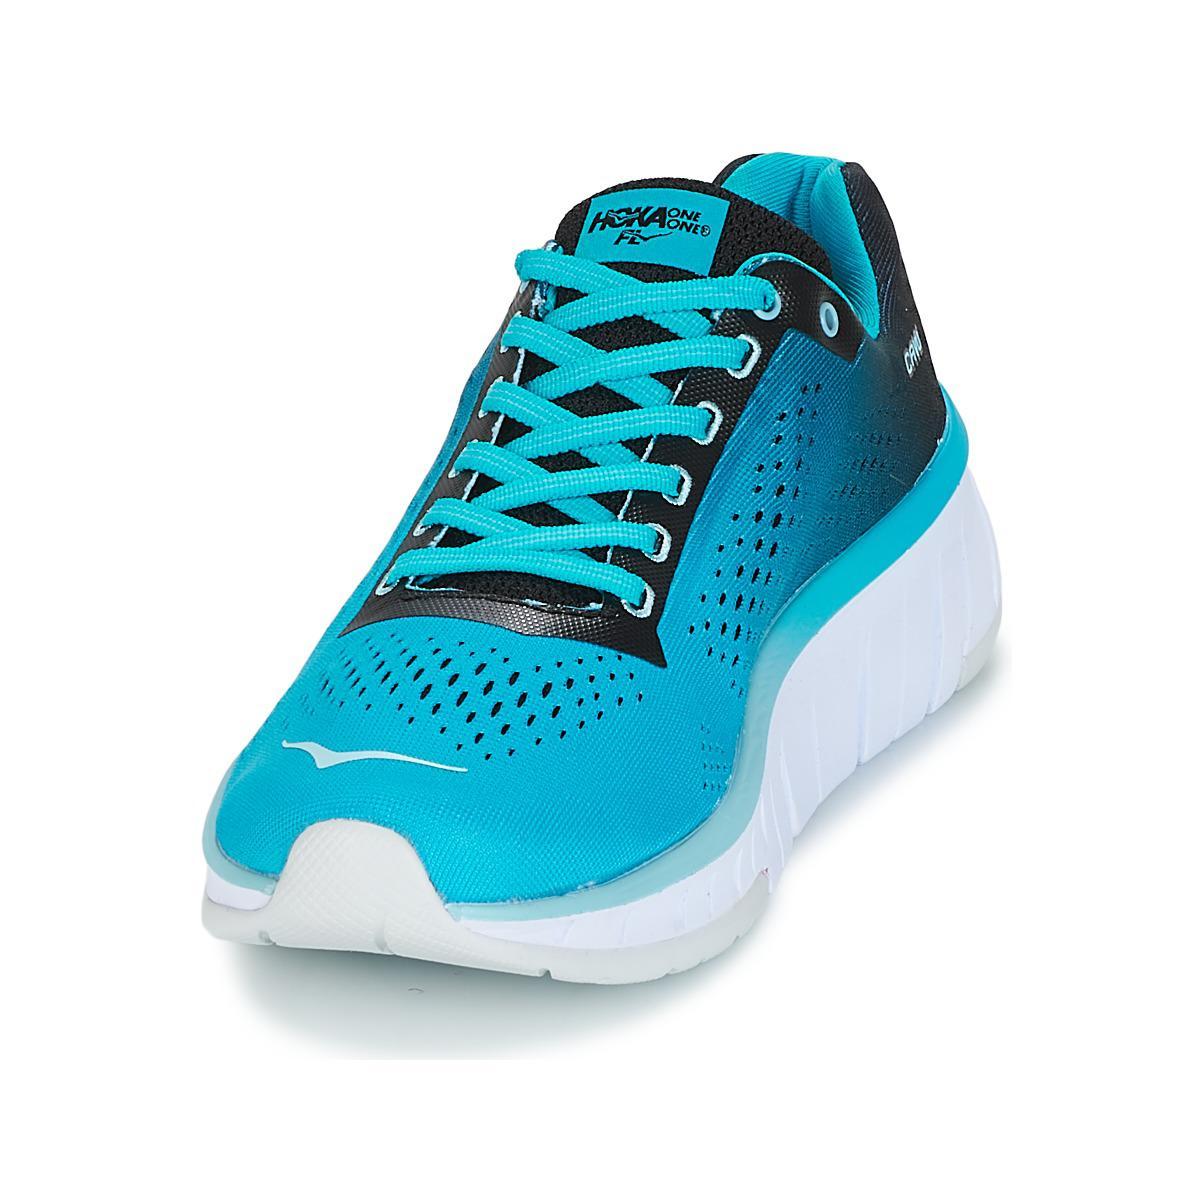 Hoka One One Cavu Women's Running Trainers In Blue